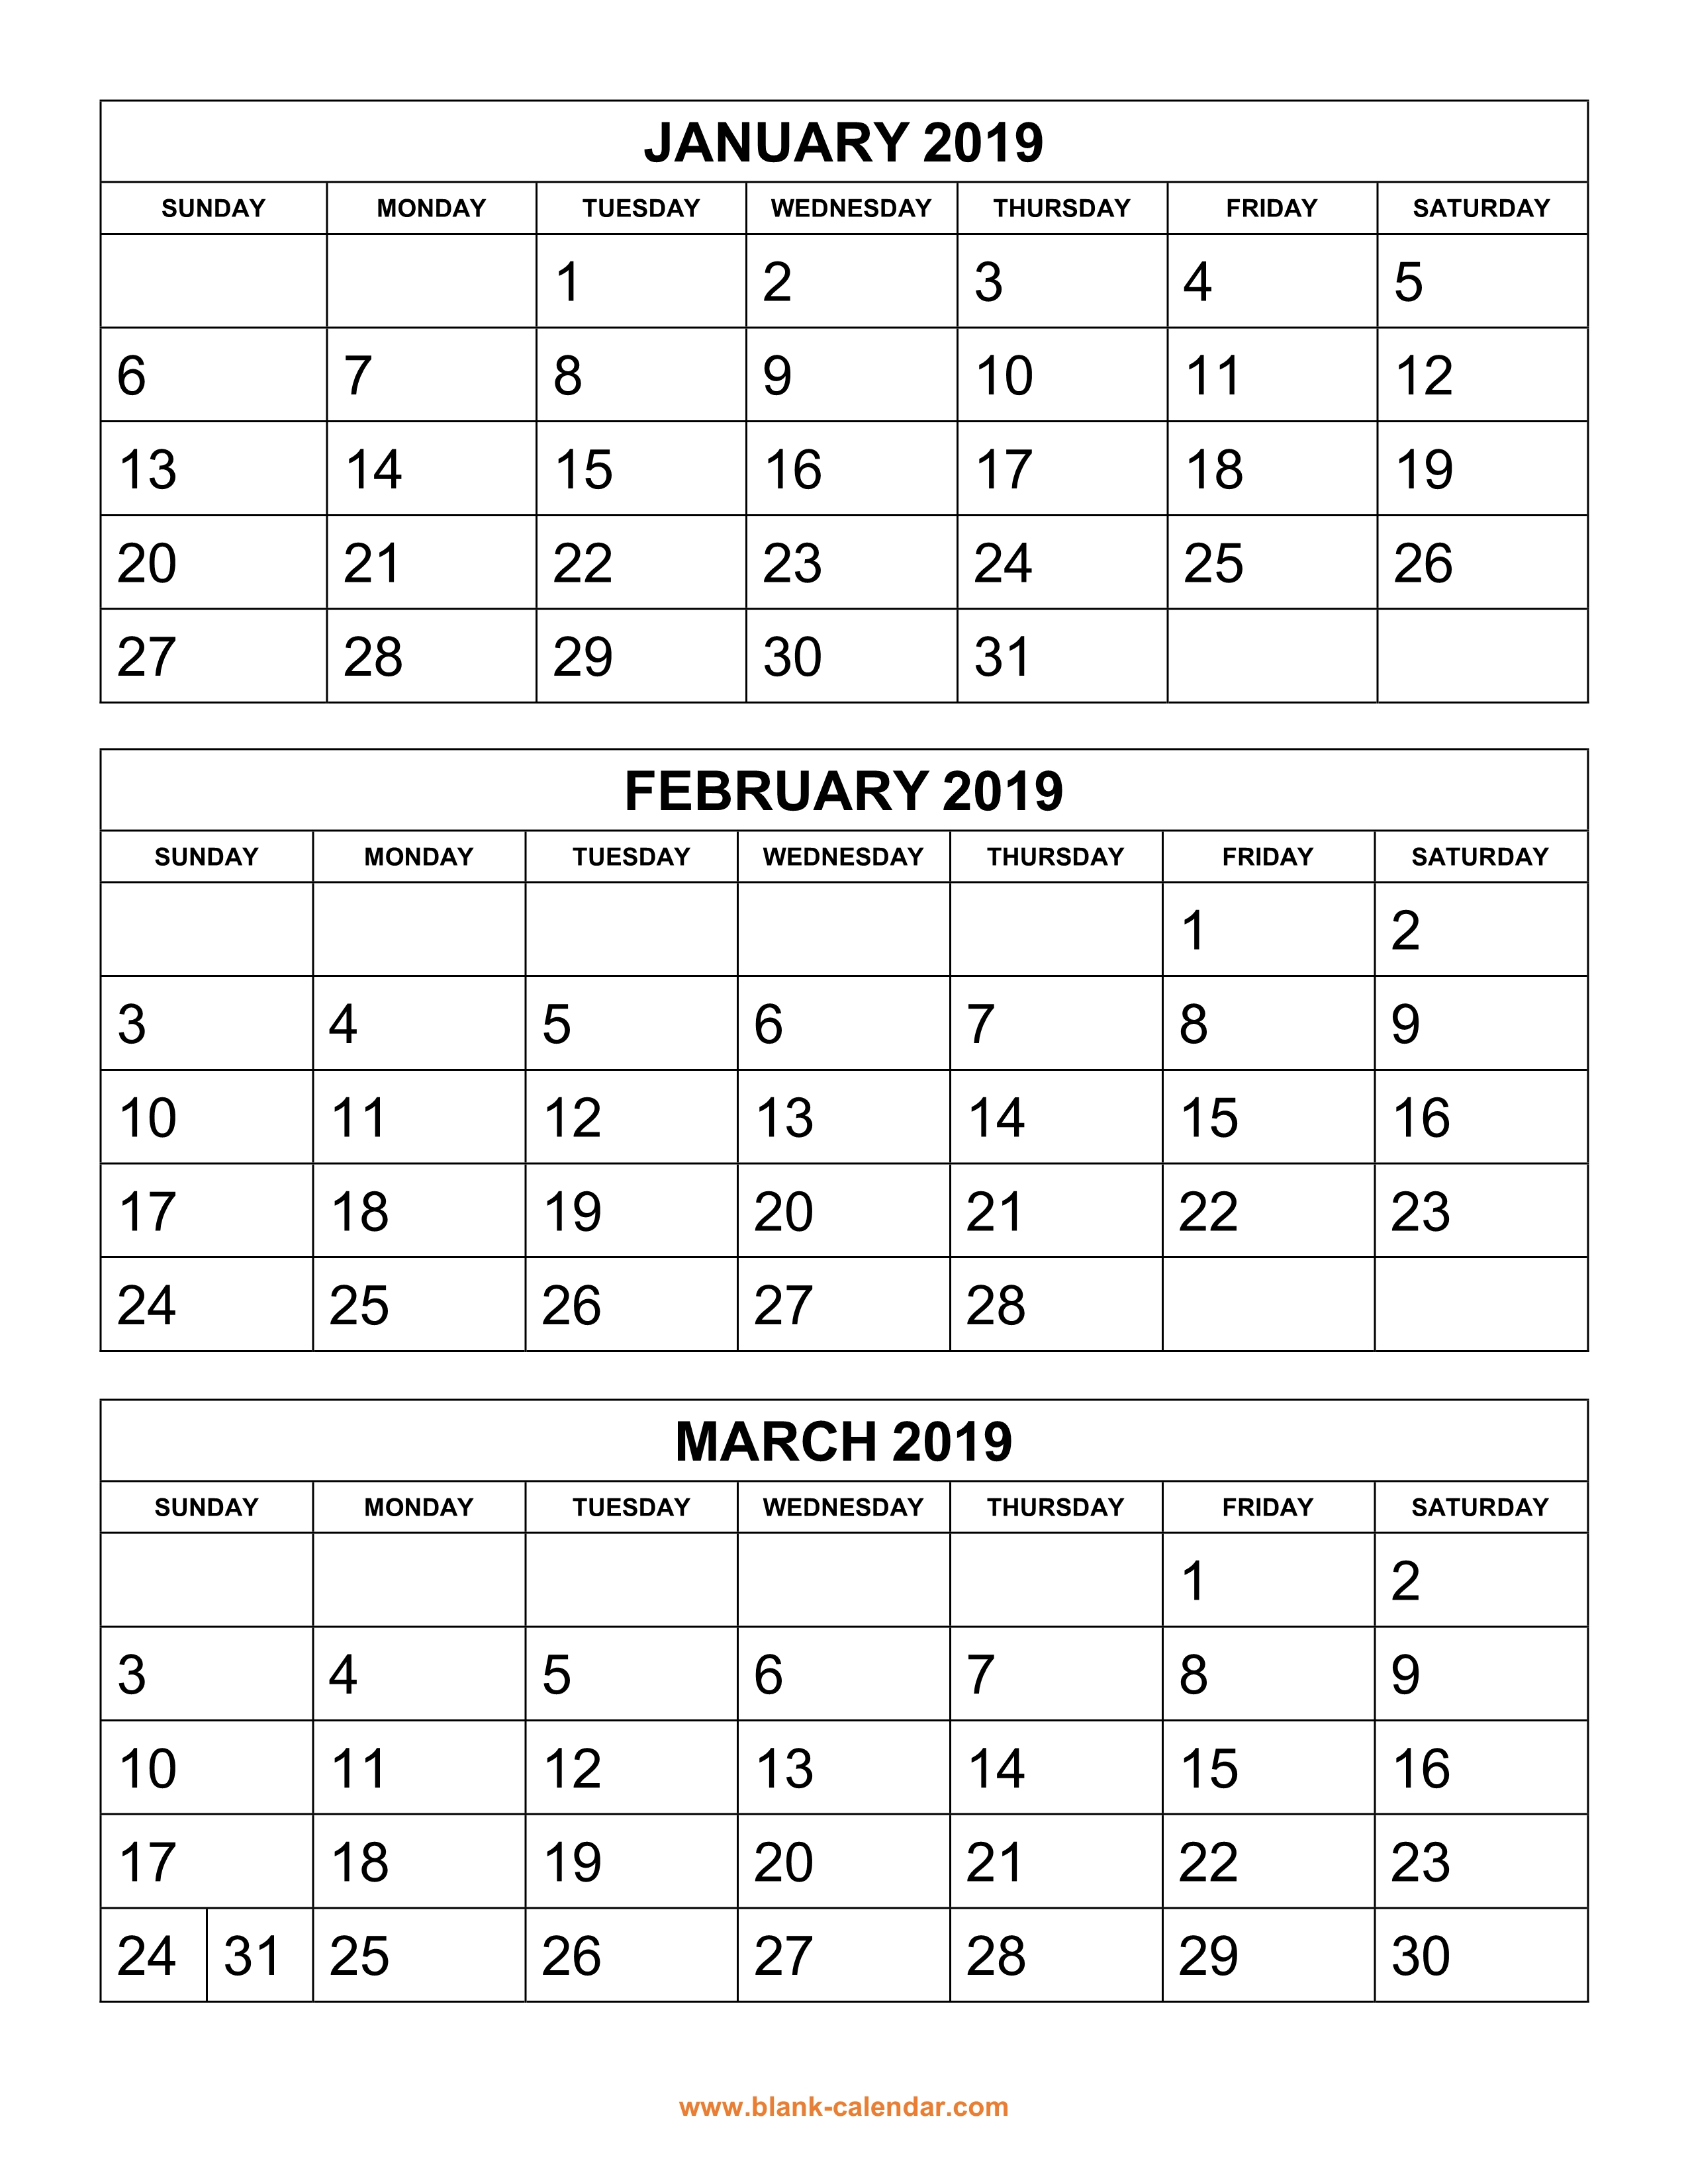 Free Download Printable Calendar 2019, 3 Months Per Page, 4 with regard to Printable Calendar 3 Months Per Page